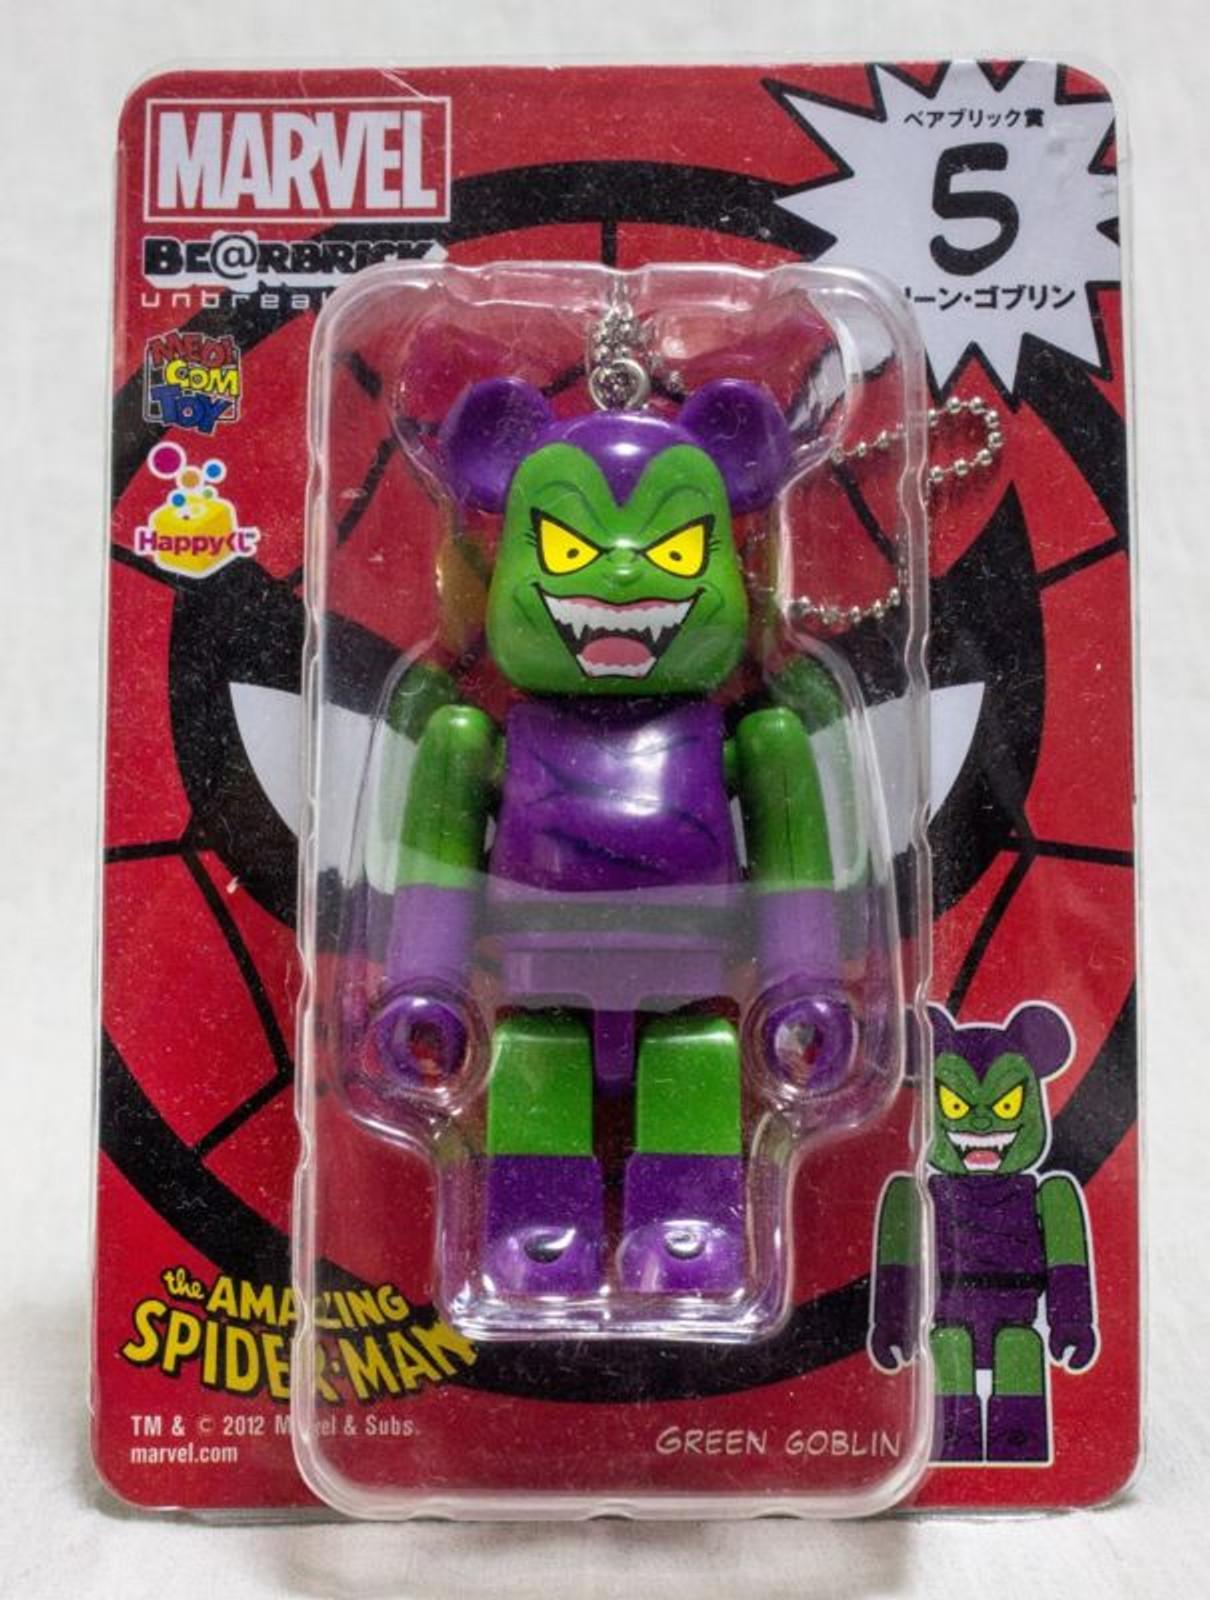 Bearbrick Amazing Spiderman Green Goblin Marvel Medicom Toy JAPAN BE@RBRICK